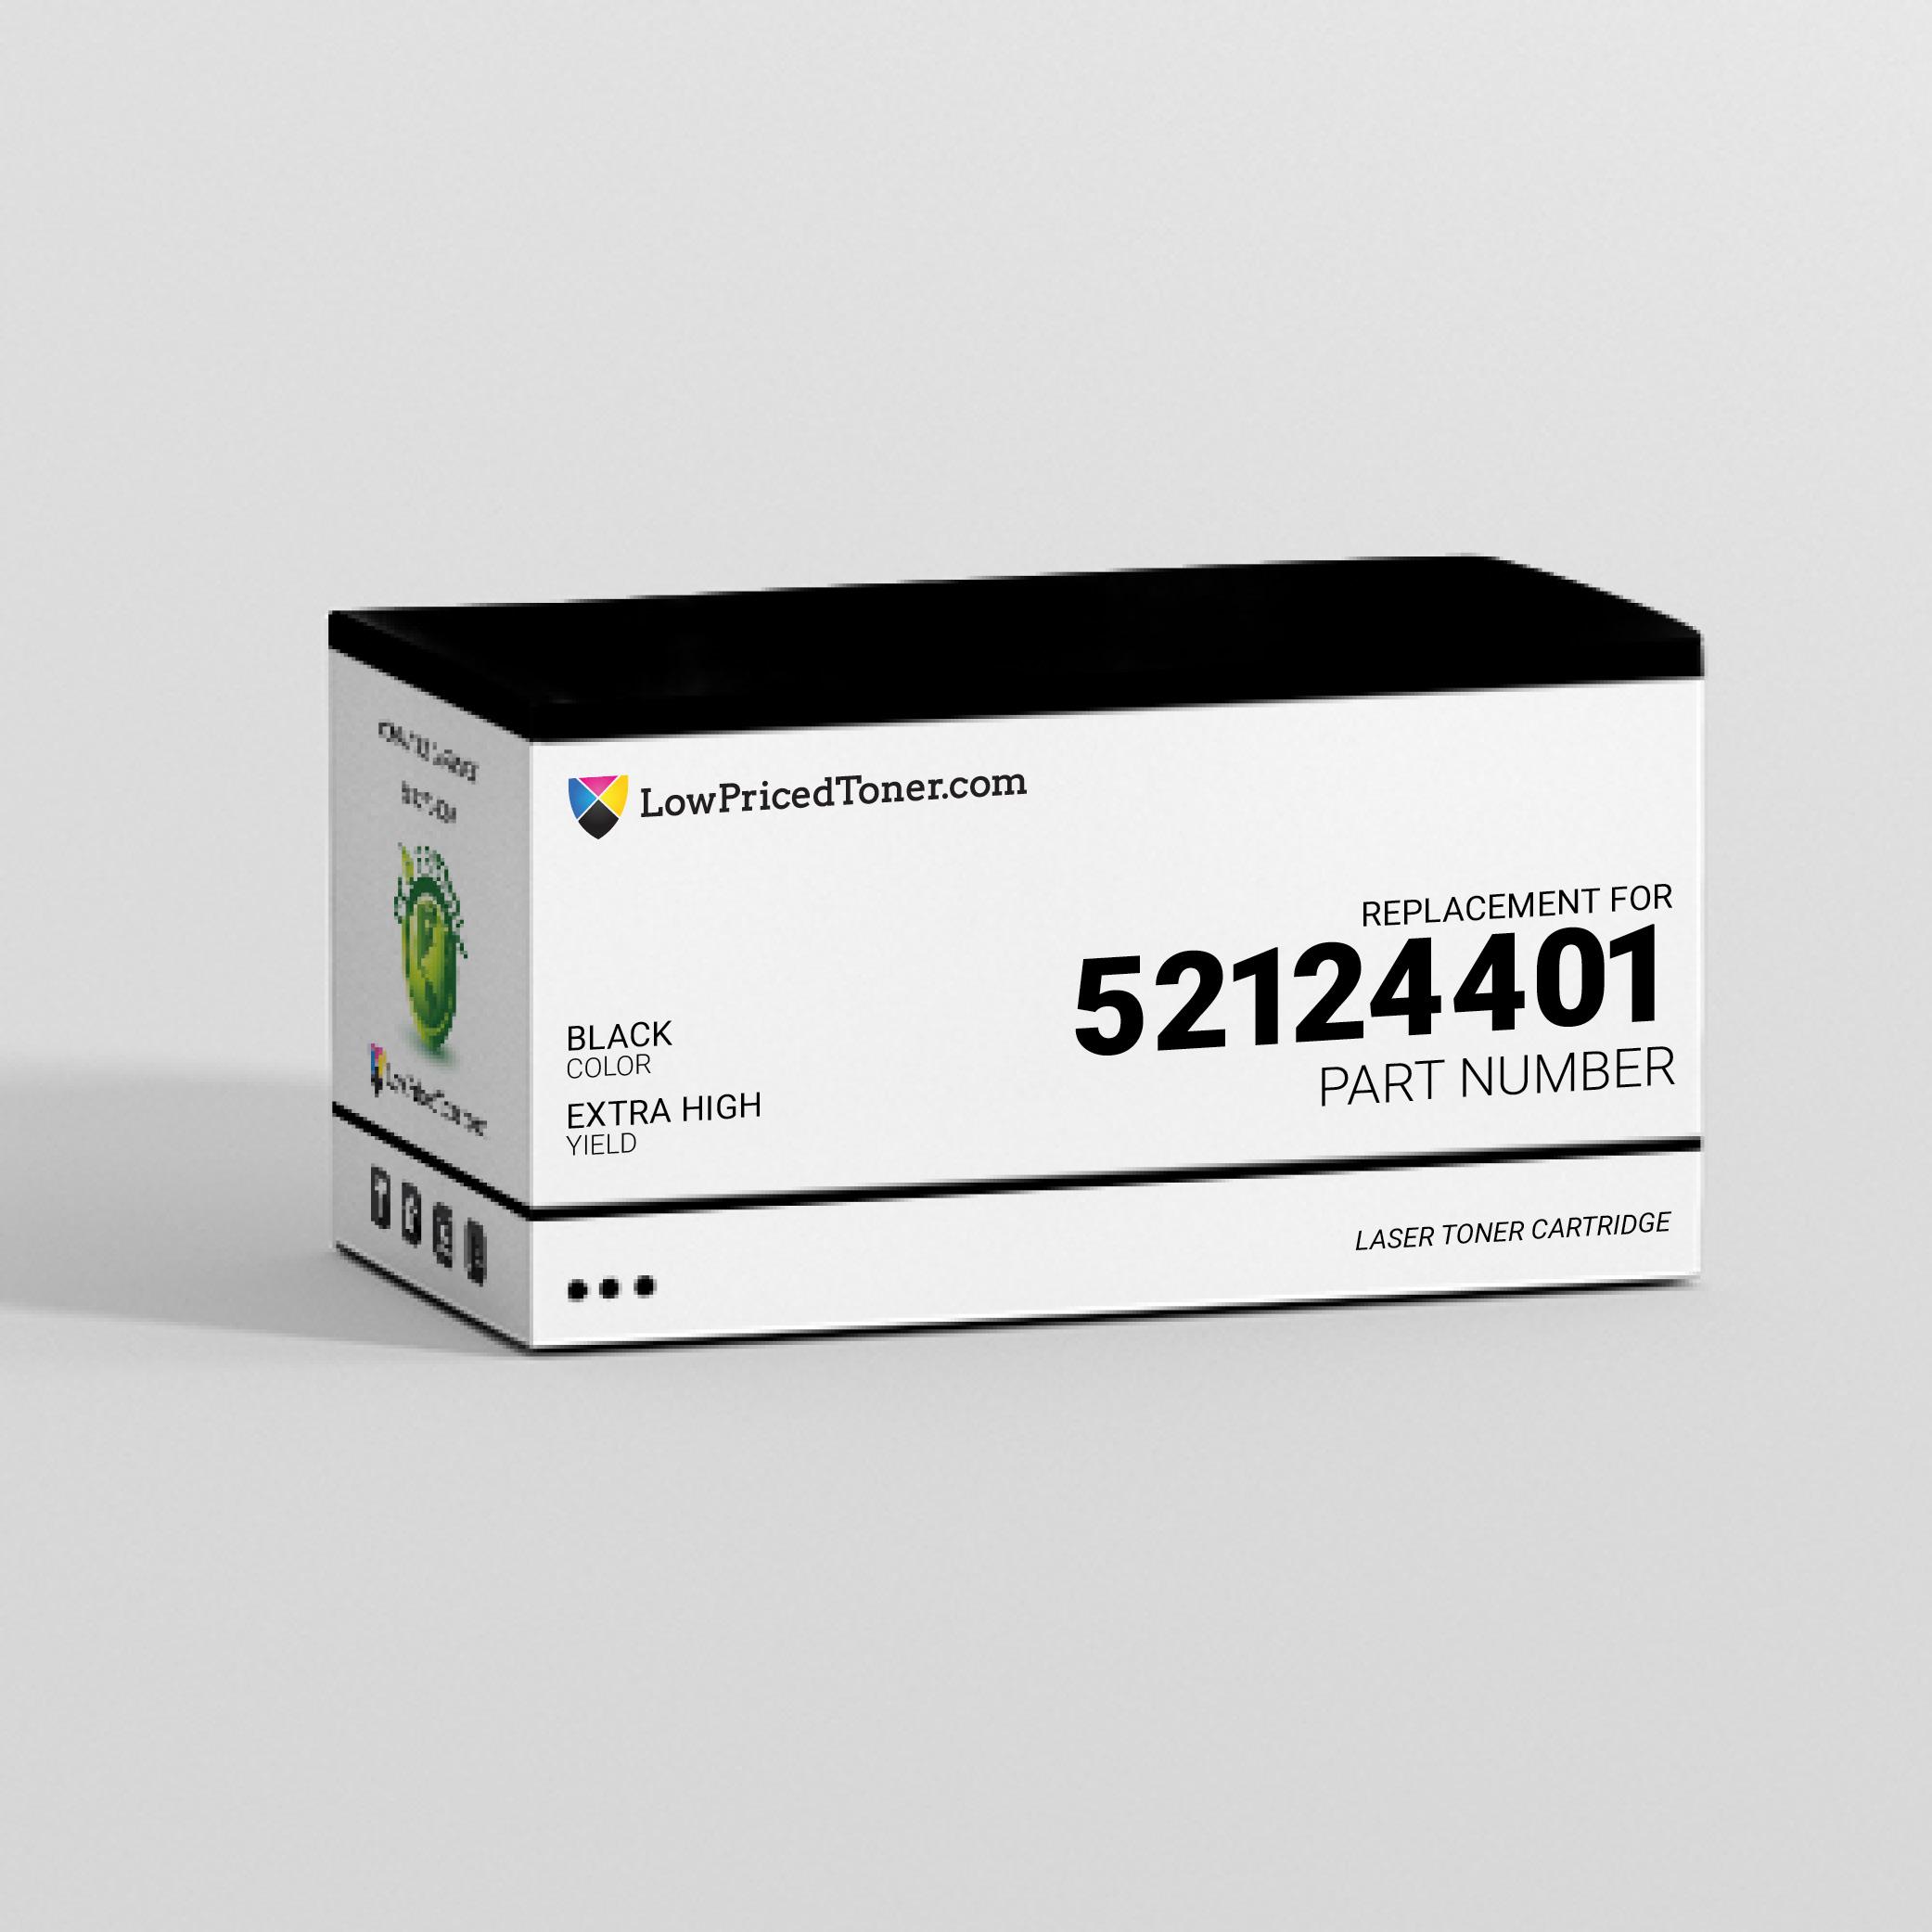 Okidata 52124401 Remanufactured Black Laser Toner Cartridge Extra High Yield